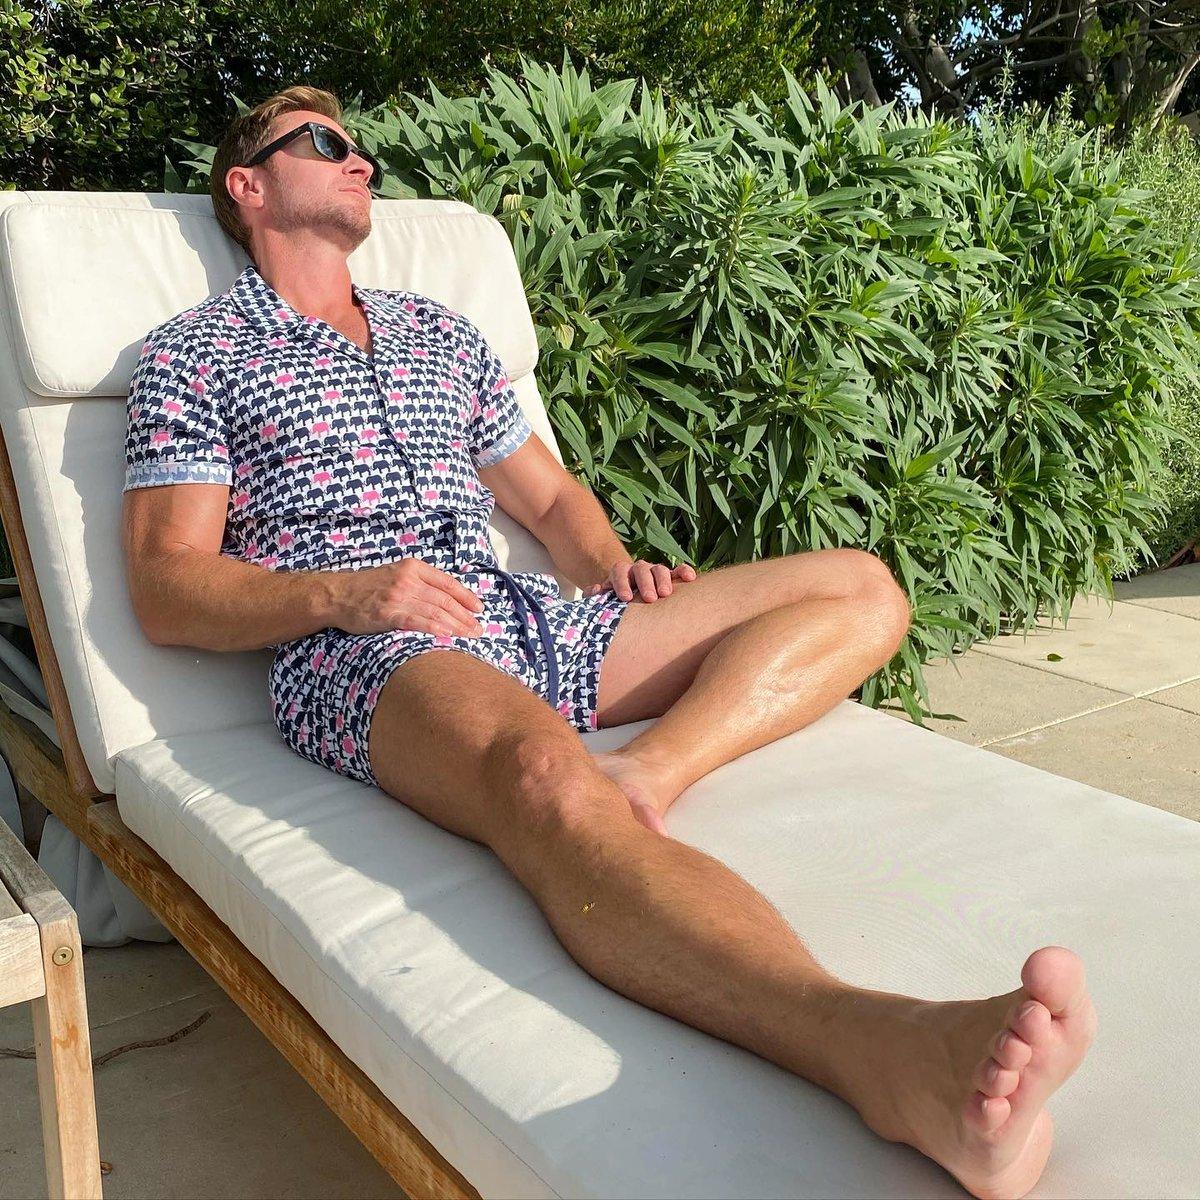 Sunday mood ☺️ @paulie_good soaking up the sun in Mr Turk ☀️ #MrTurkStyle #MrTurk